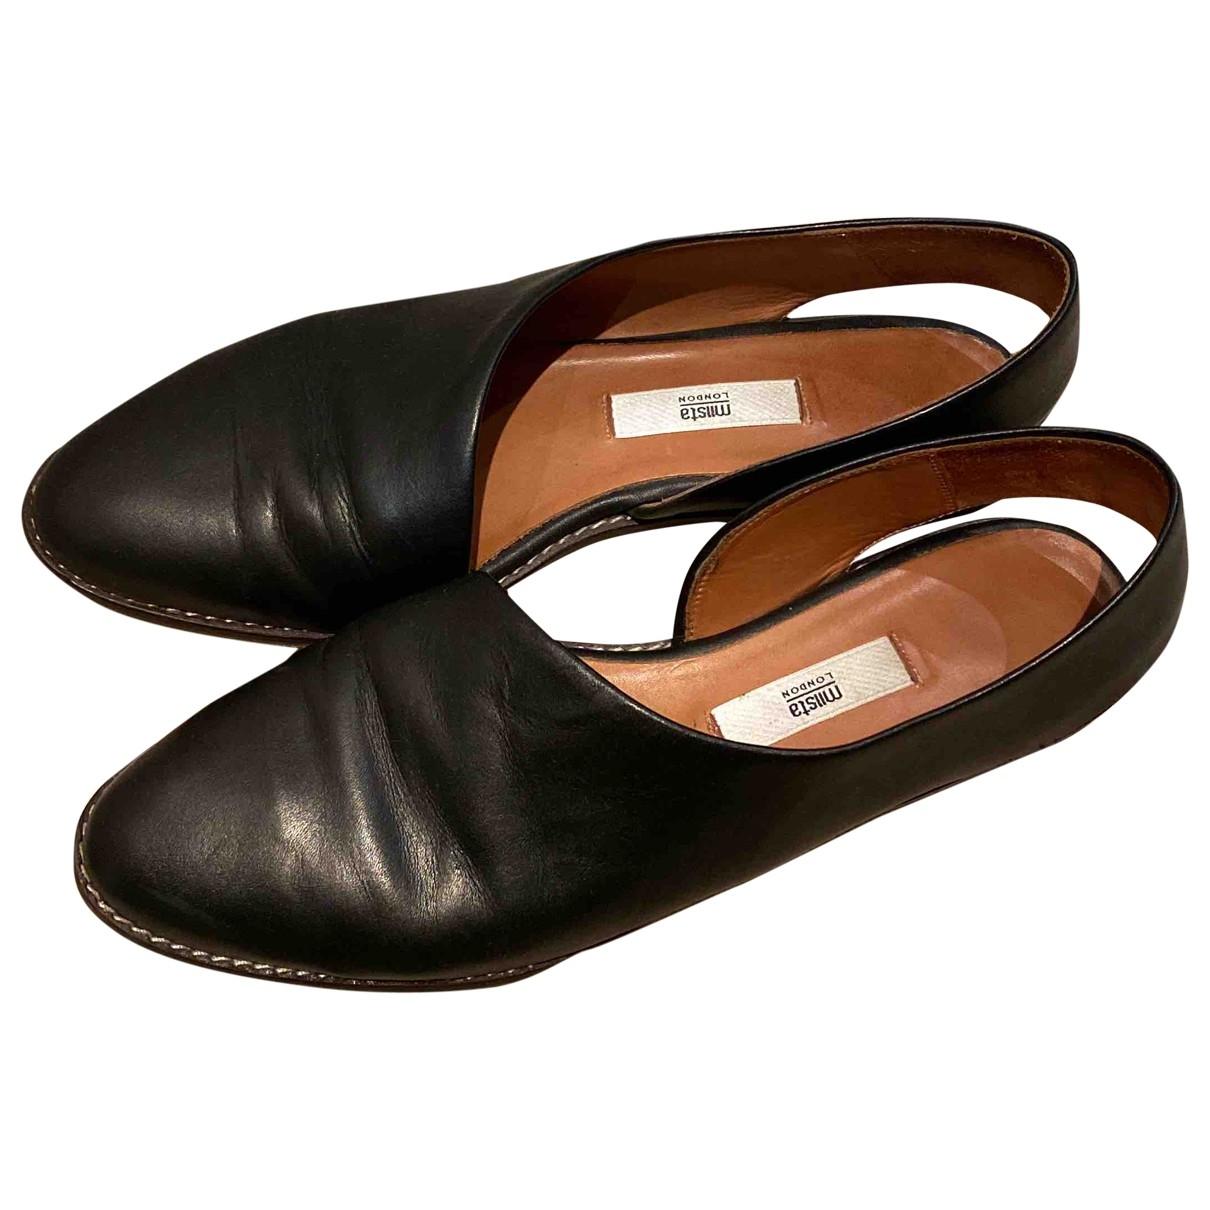 Miista \N Black Leather Mules & Clogs for Women 38.5 EU